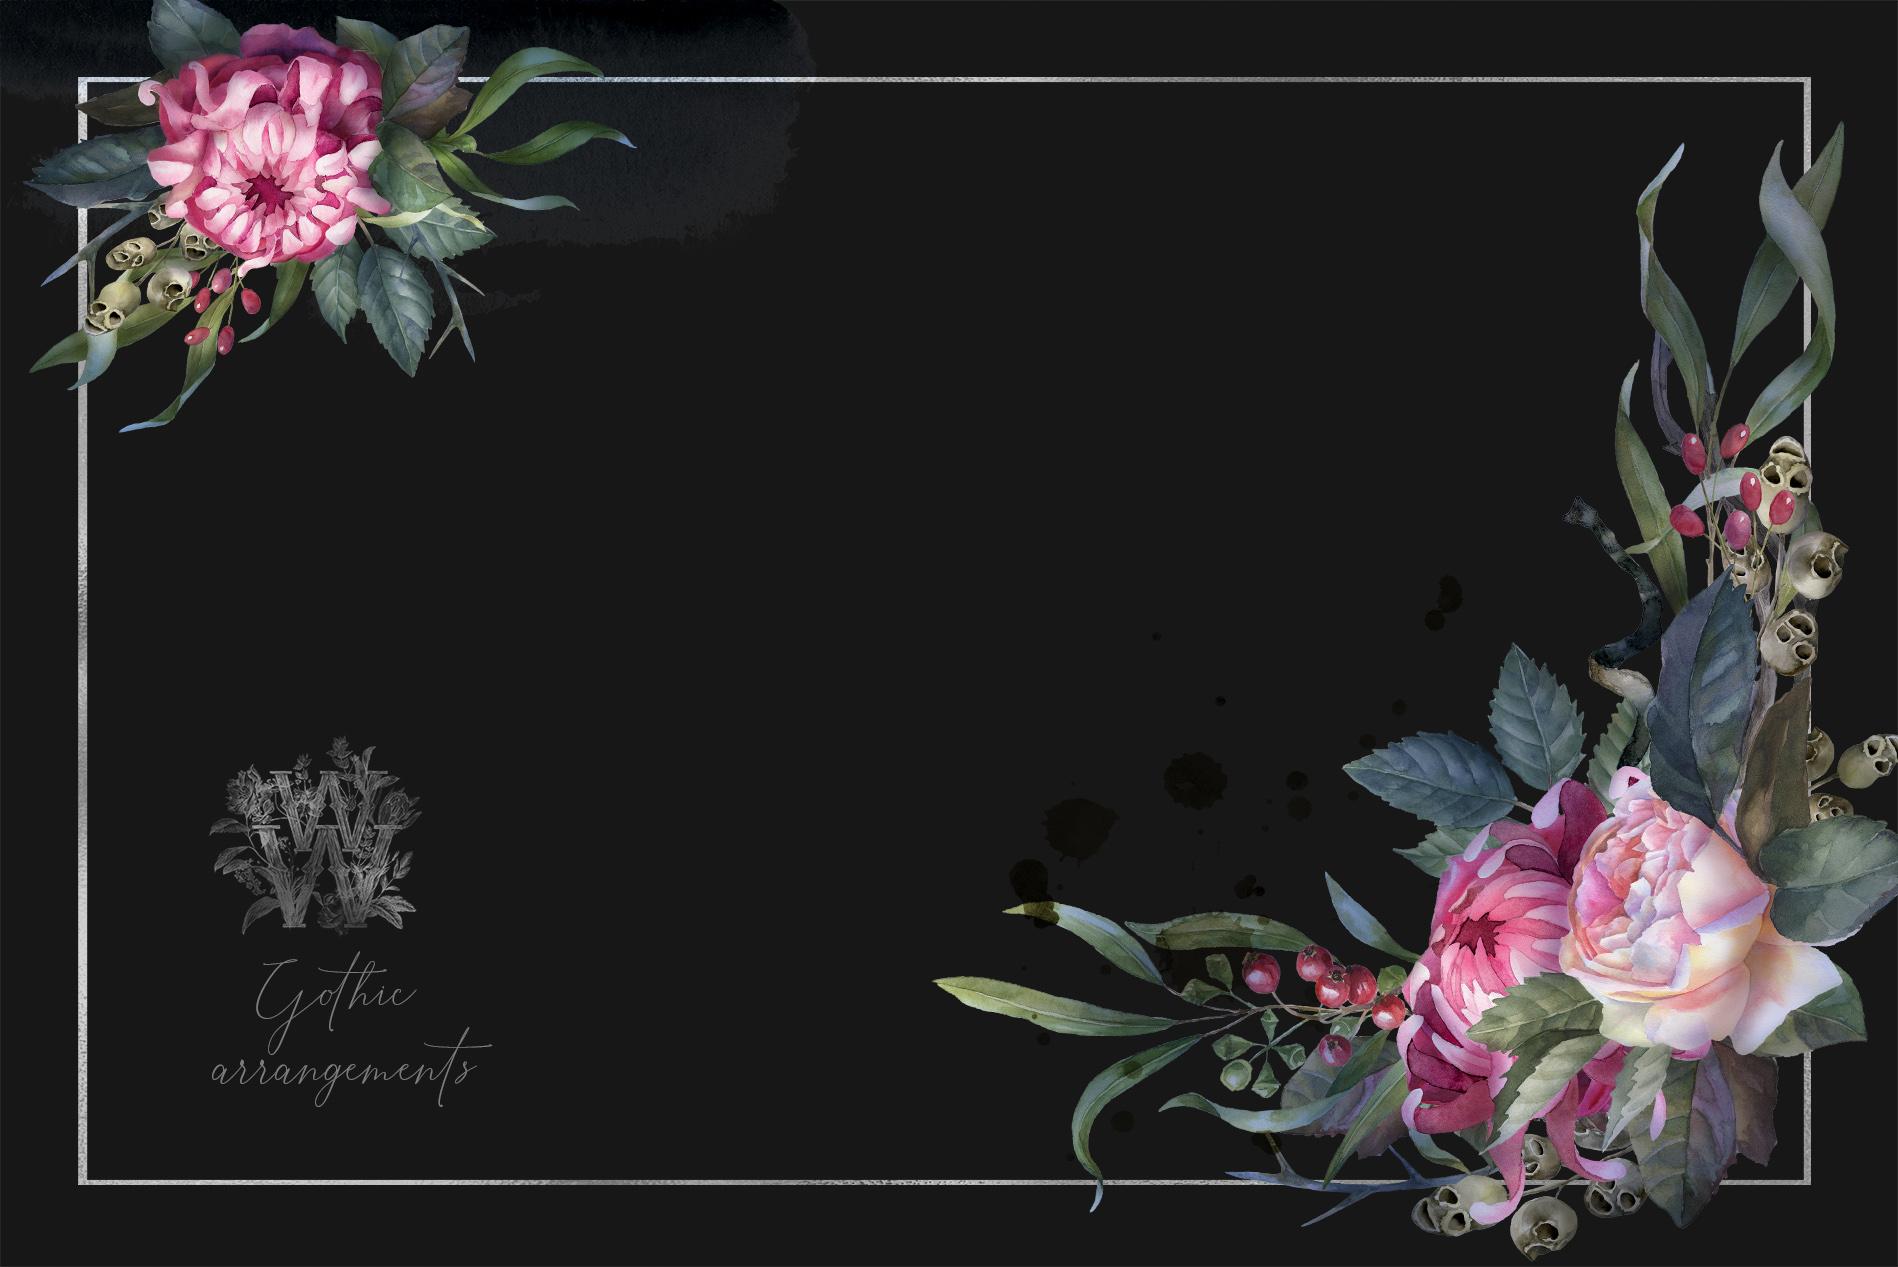 Watercolor Gothic wedding border clipart, dark Halloween example image 8